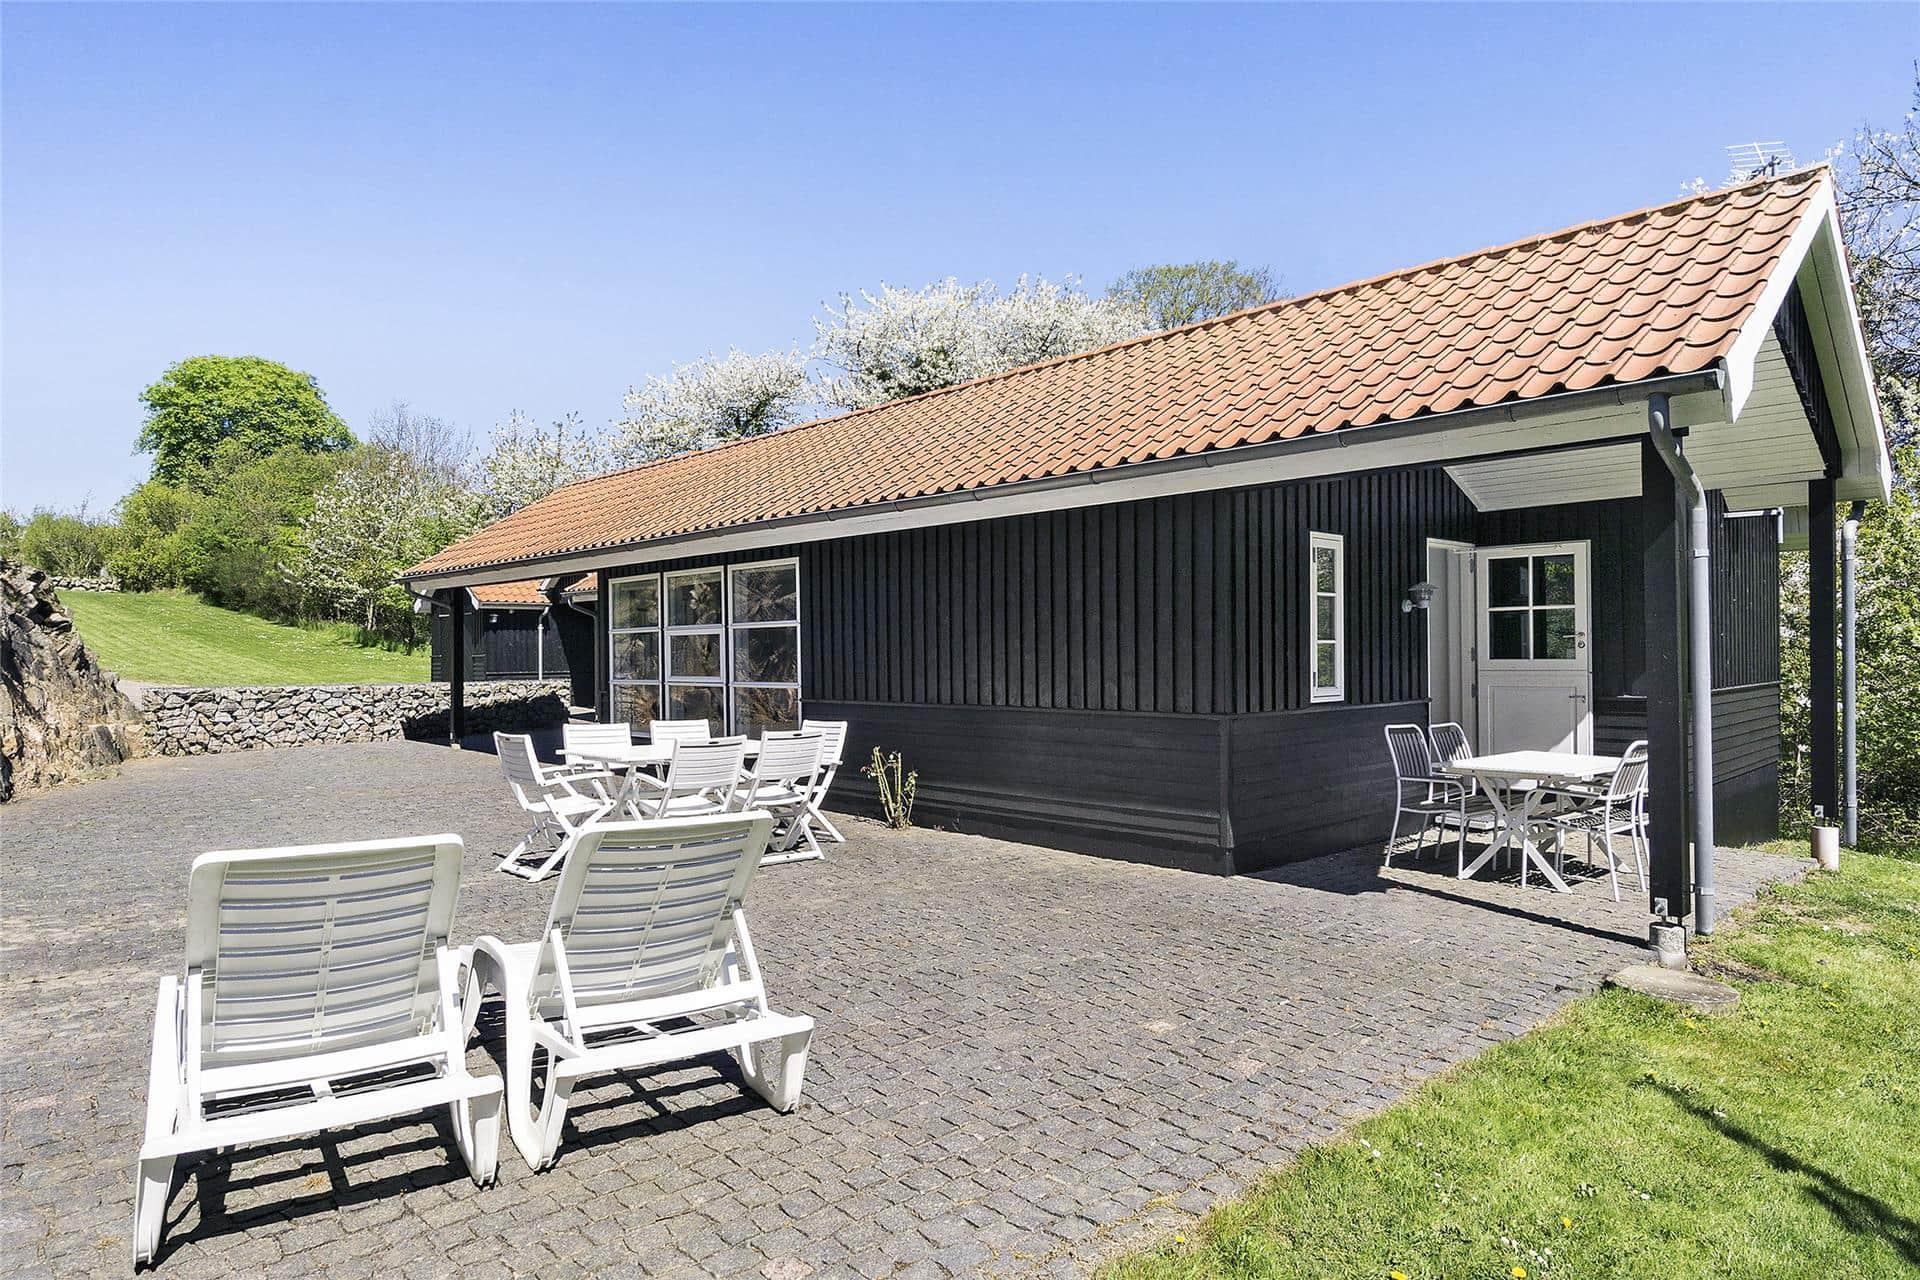 Bild 1-10 Ferienhaus 6661, Lundegårdsvej 7, DK - 3770 Allinge